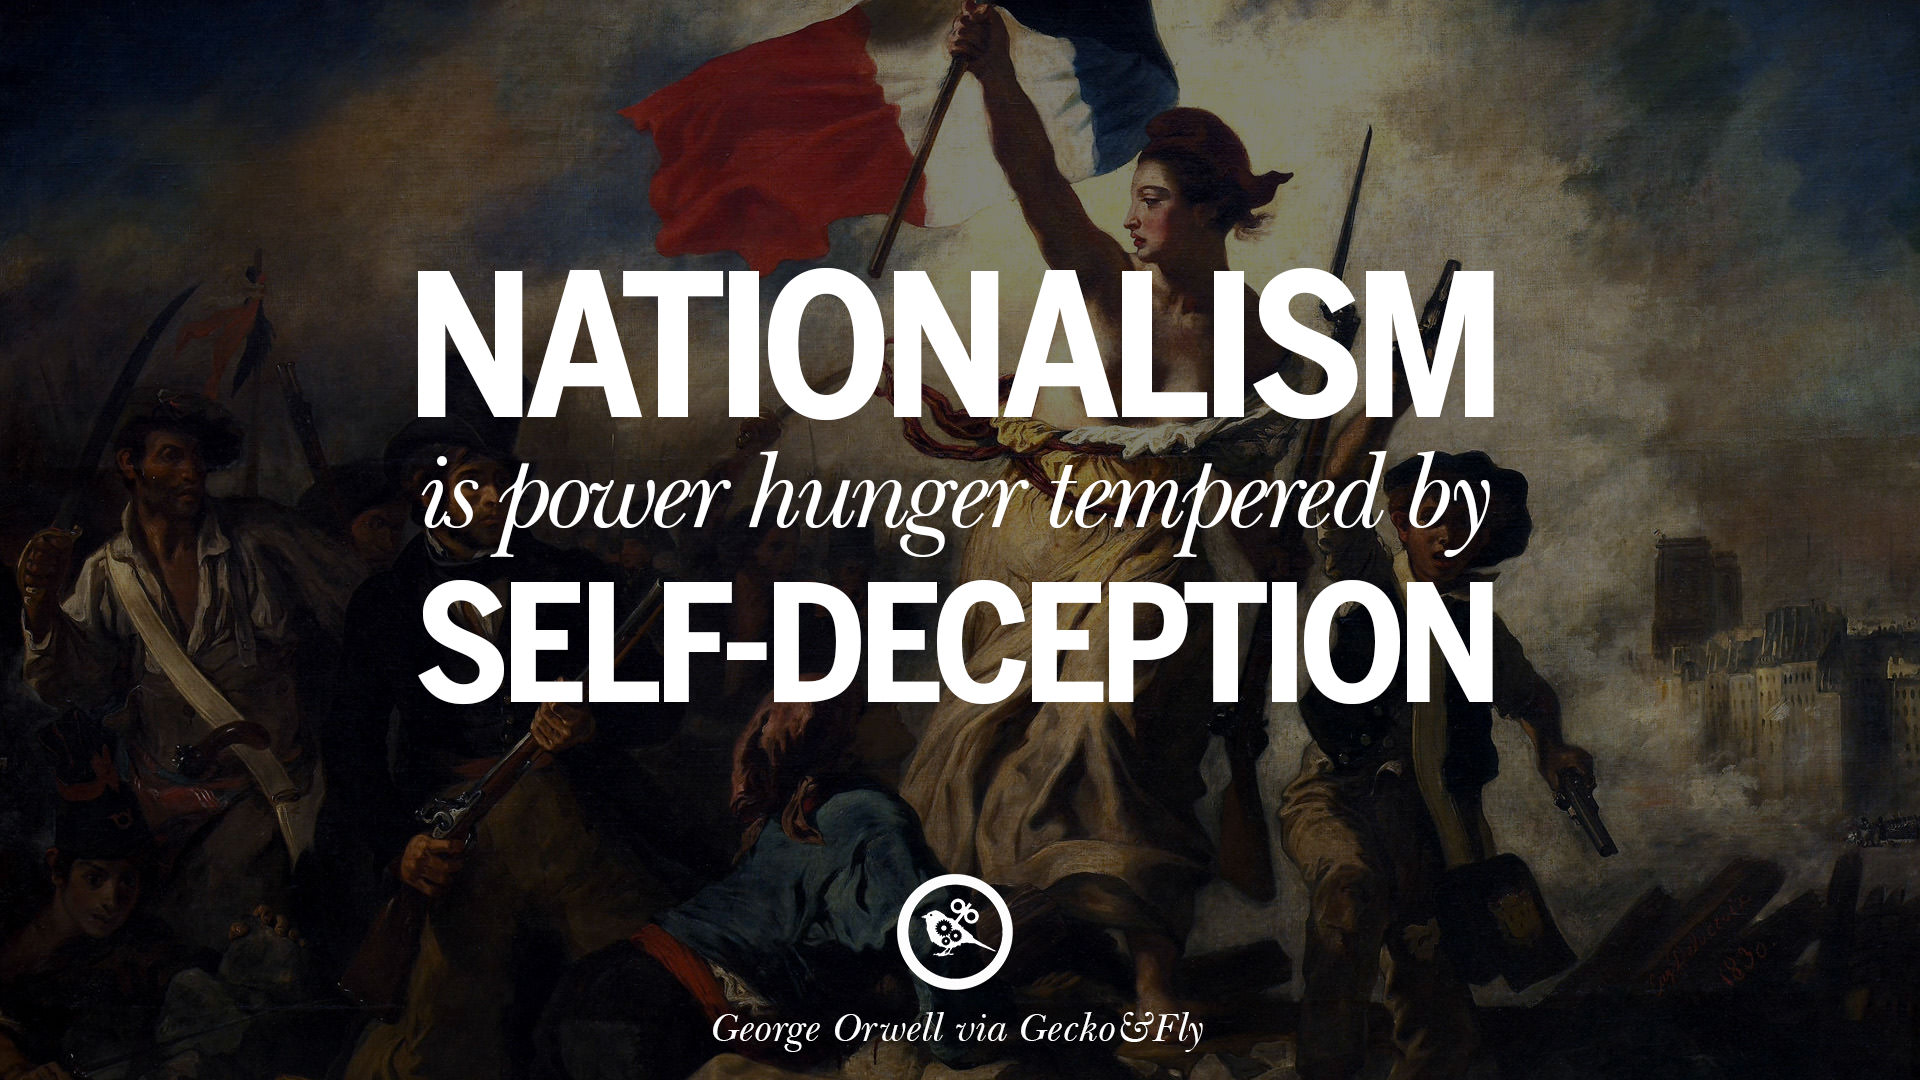 George Orwell 1984 Quotes 10 Best George Orwell Quotes From 1984 Book On War Nationalism